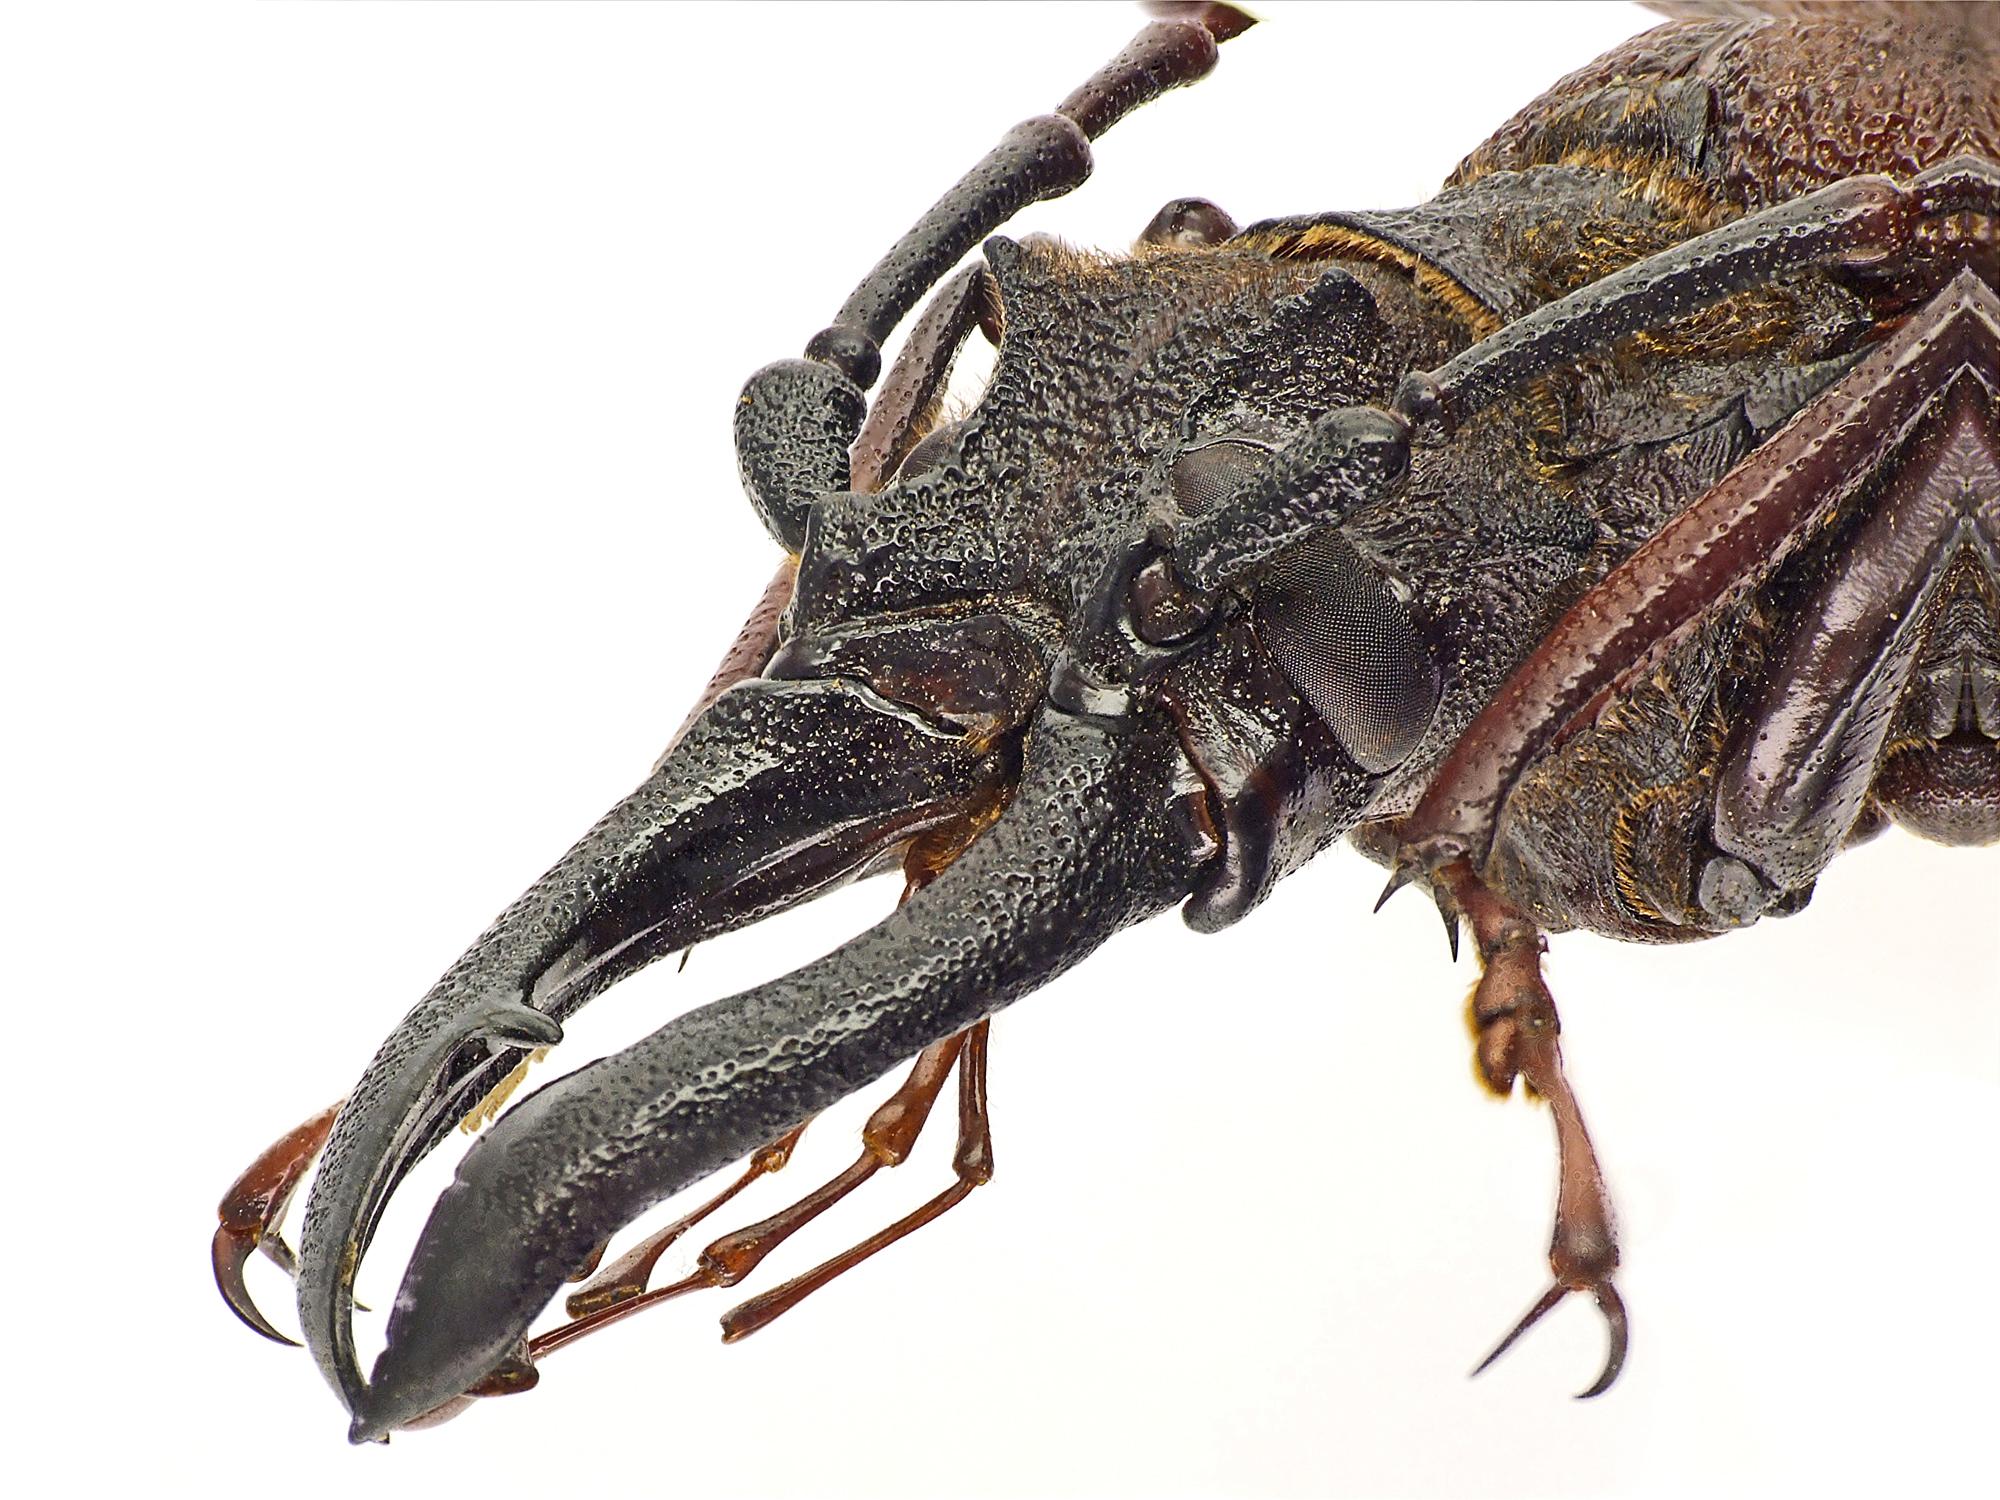 Psalidognathus erythrocerus 47440cz60.jpg